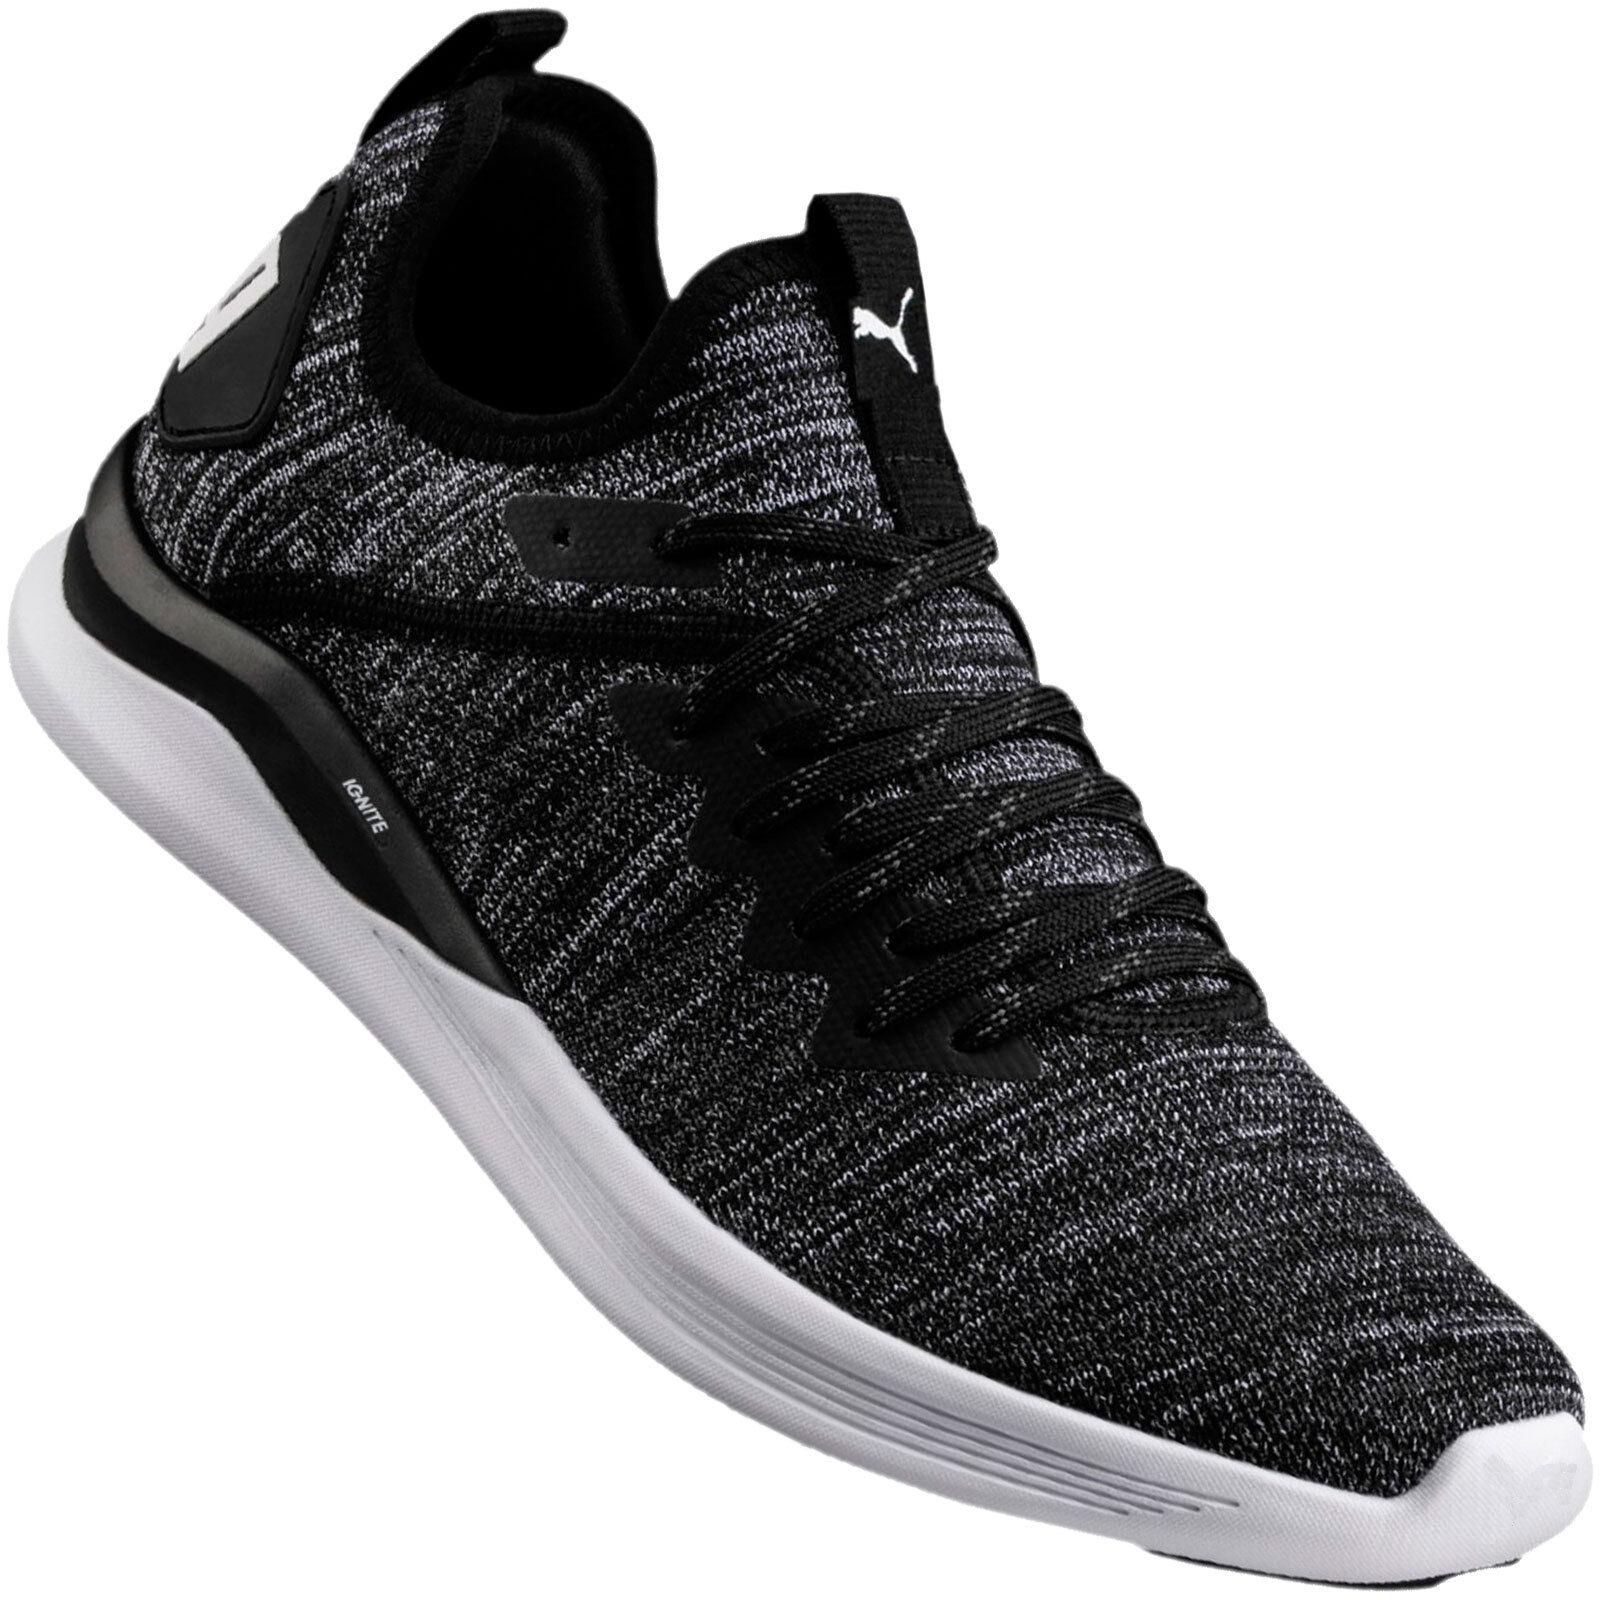 Puma Ignite deporte Flash evoknit Zapatos Zapatillas de deporte Ignite Hombres b922c1